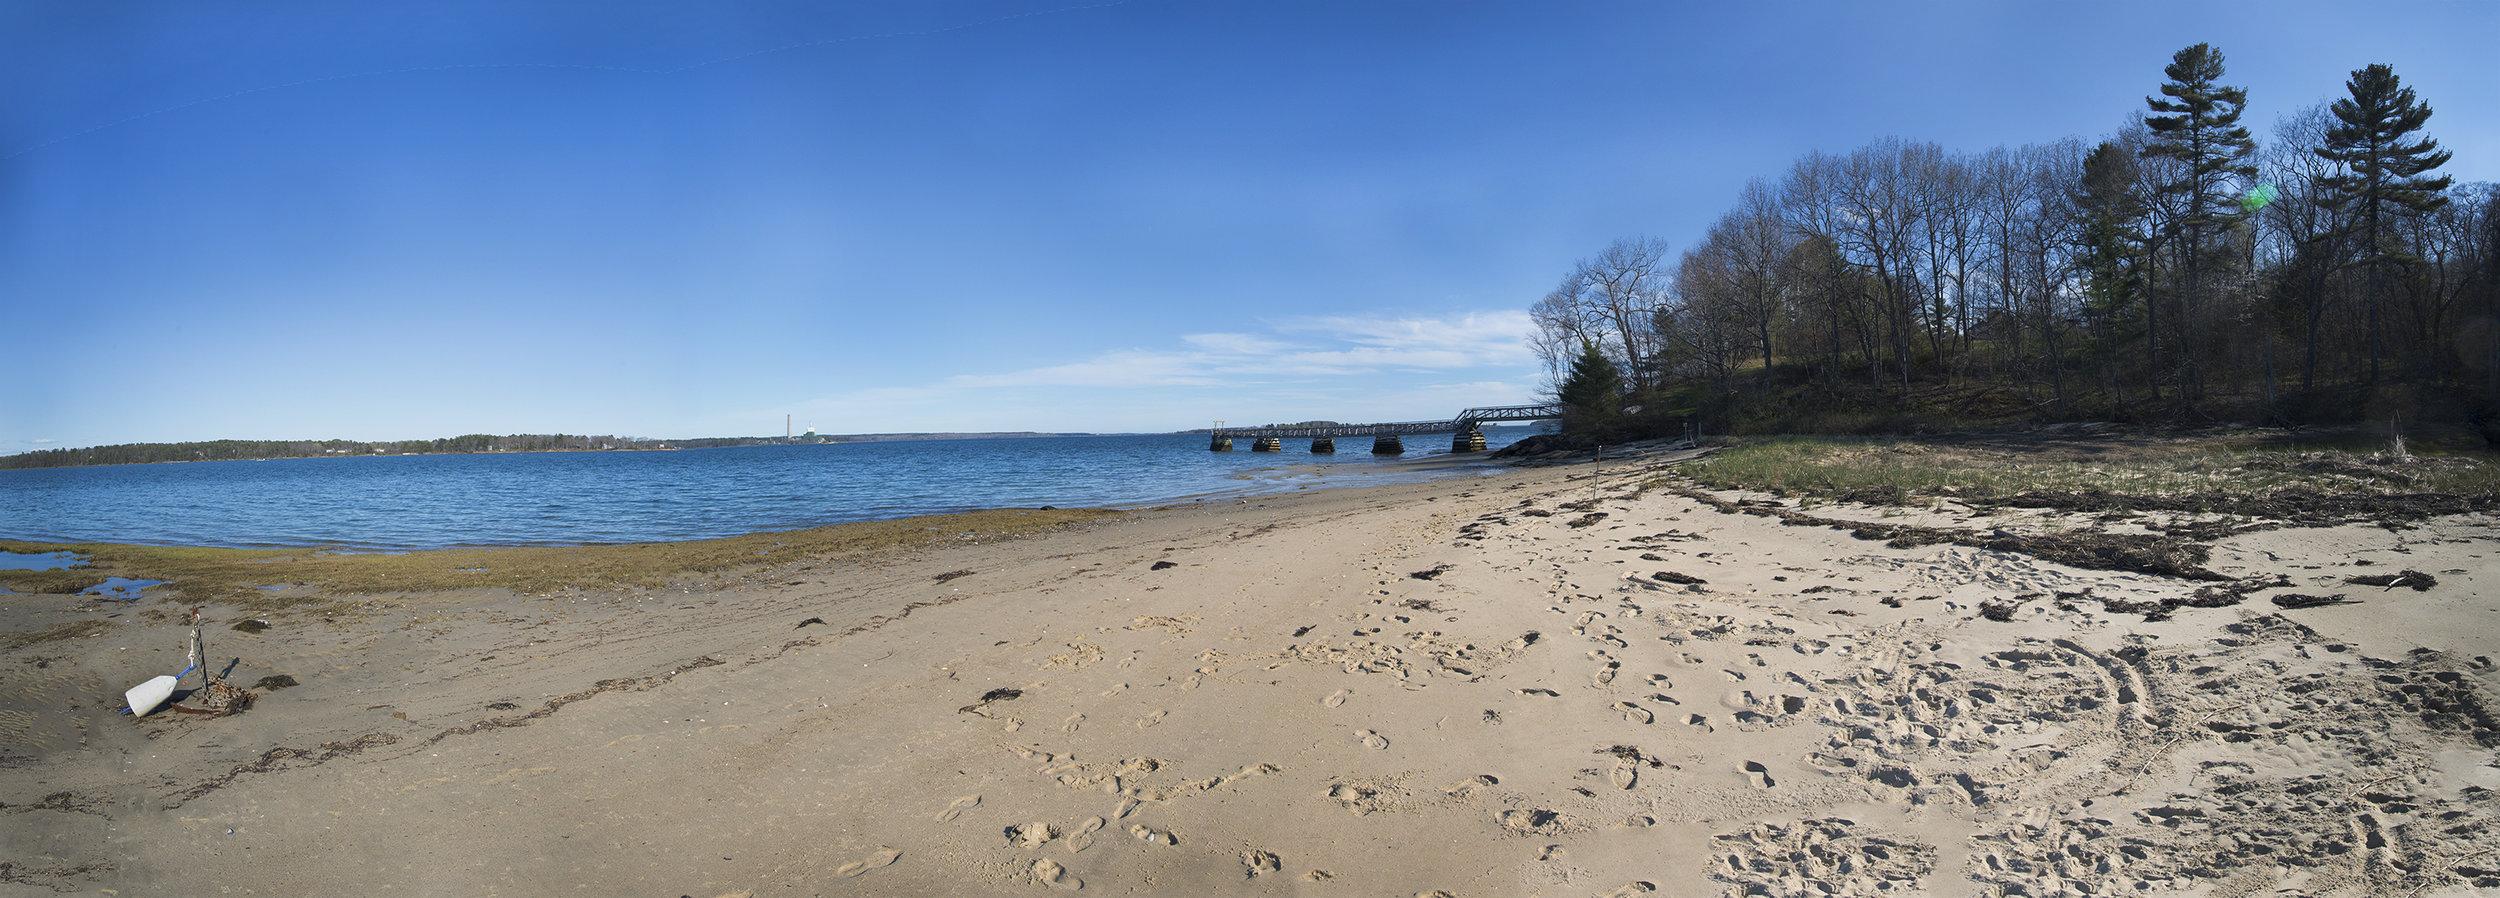 Broad Cove Reserve (Steve Thomas) 3.jpg